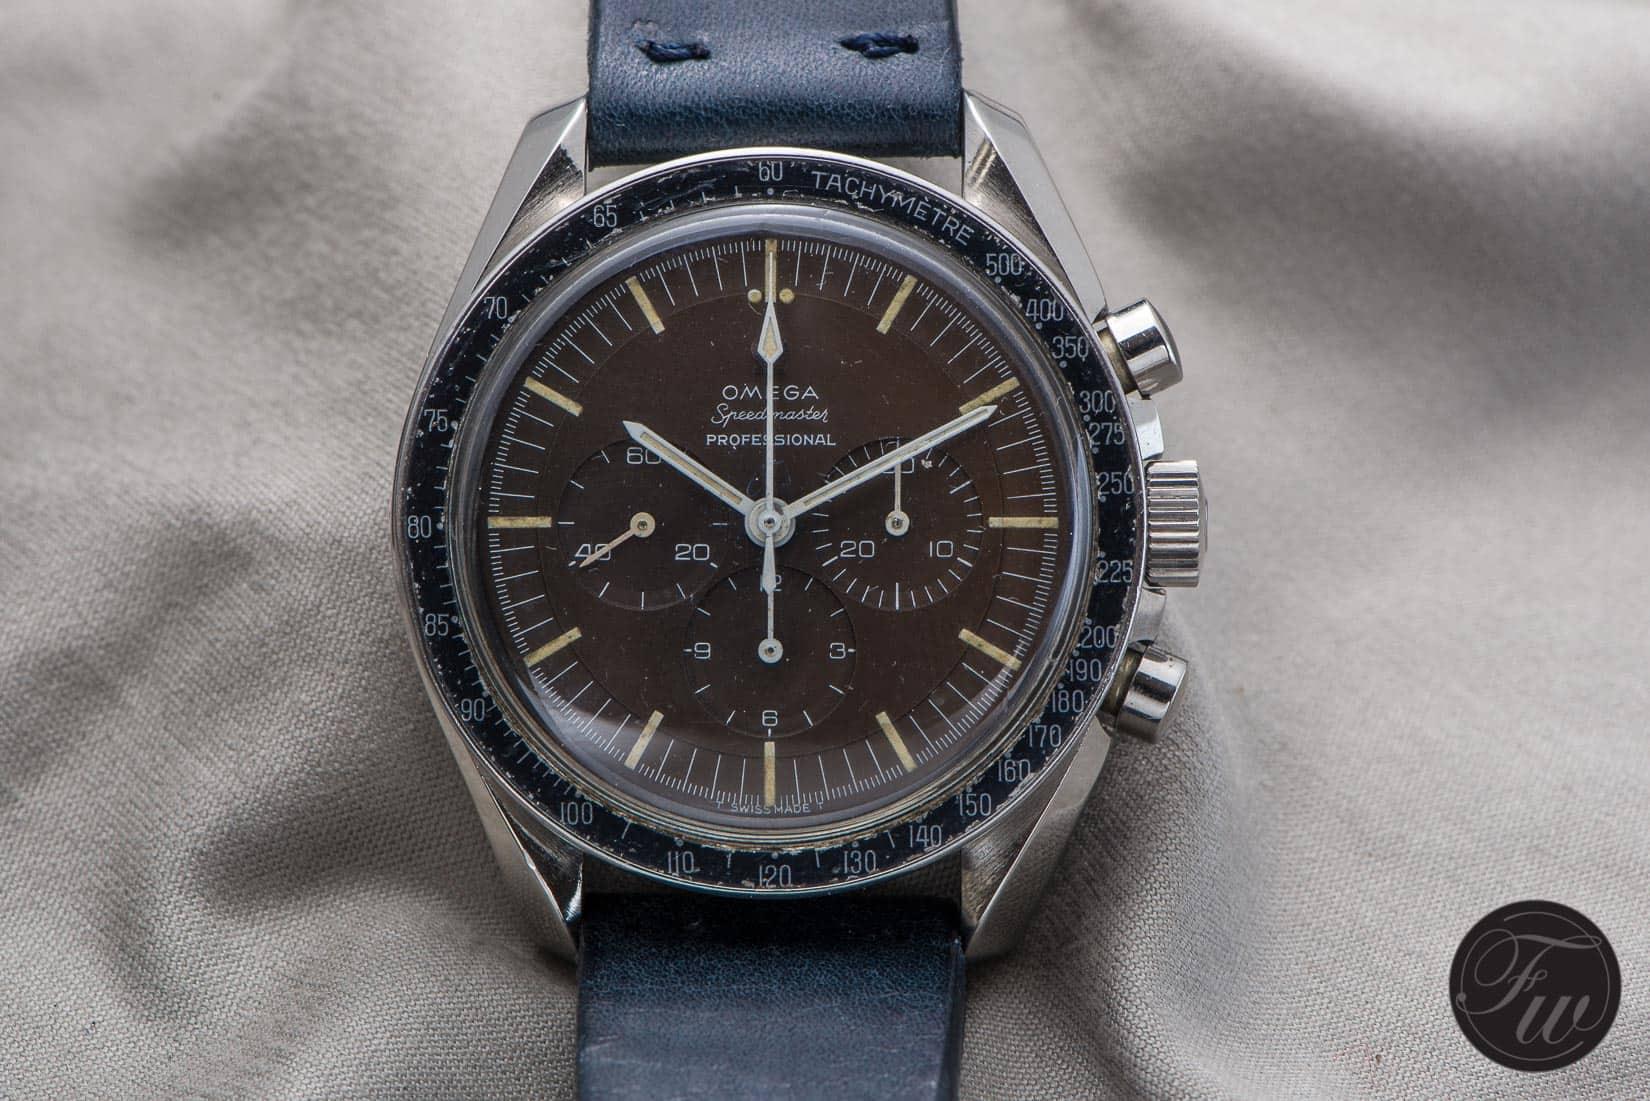 Omega Speedmaster 105.012-64 - original Moonwatch